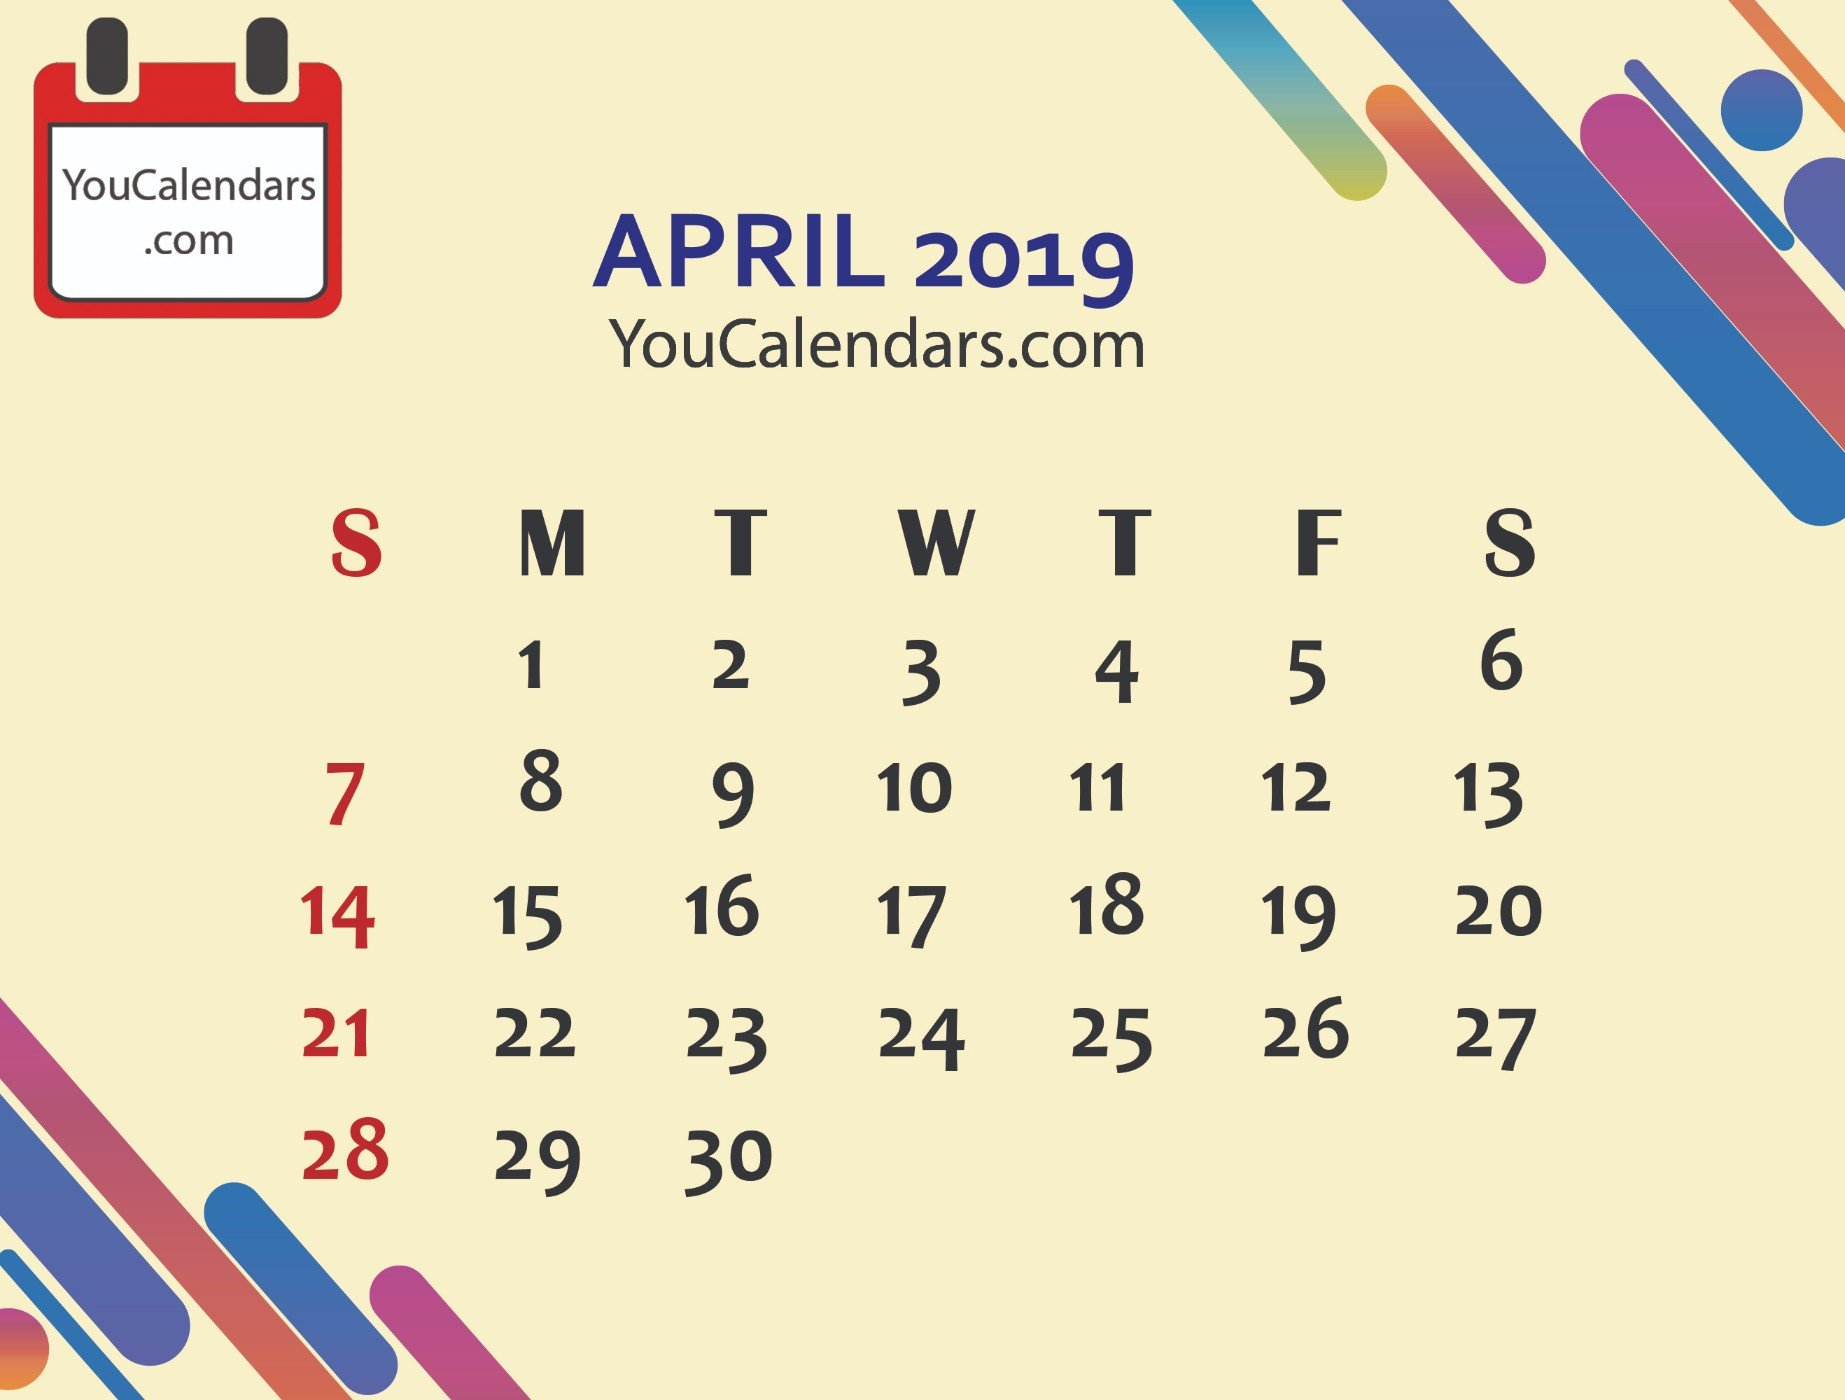 ✅Free April 2019 Calendar Printable Template – You Calendars April 7 2019 Calendar